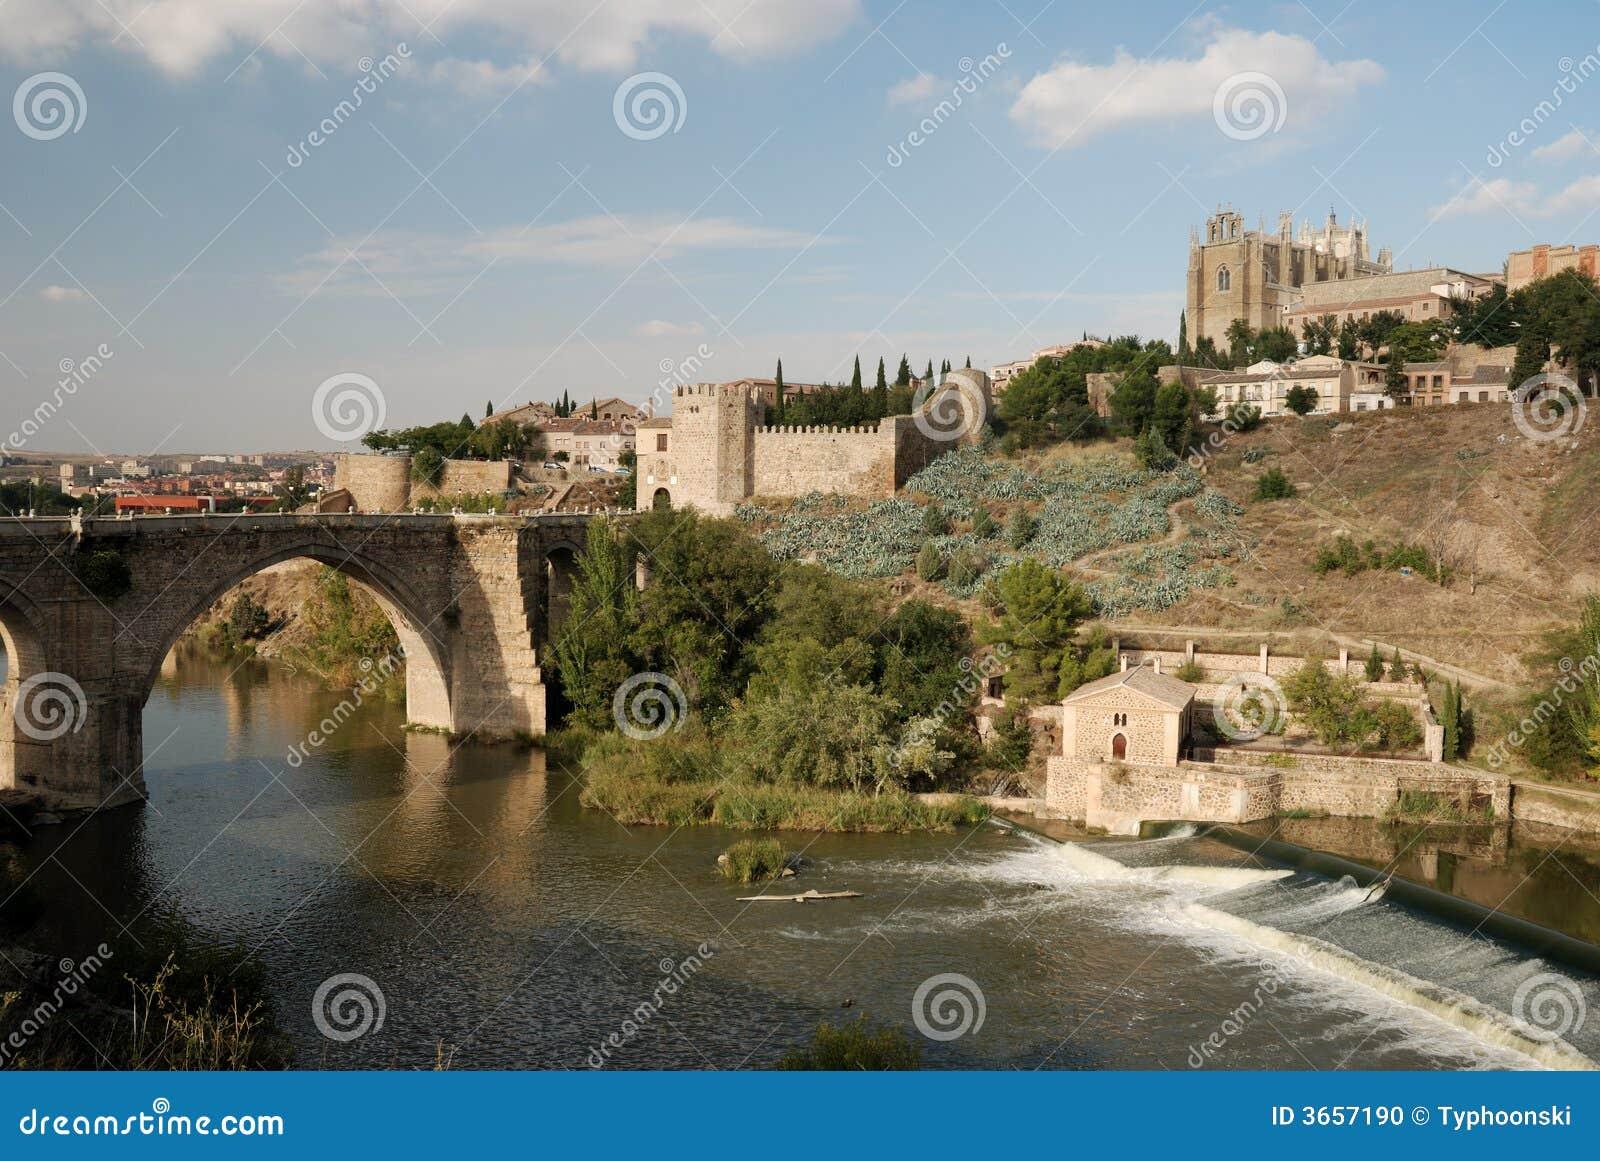 Bridge over the Tagus river in Toledo